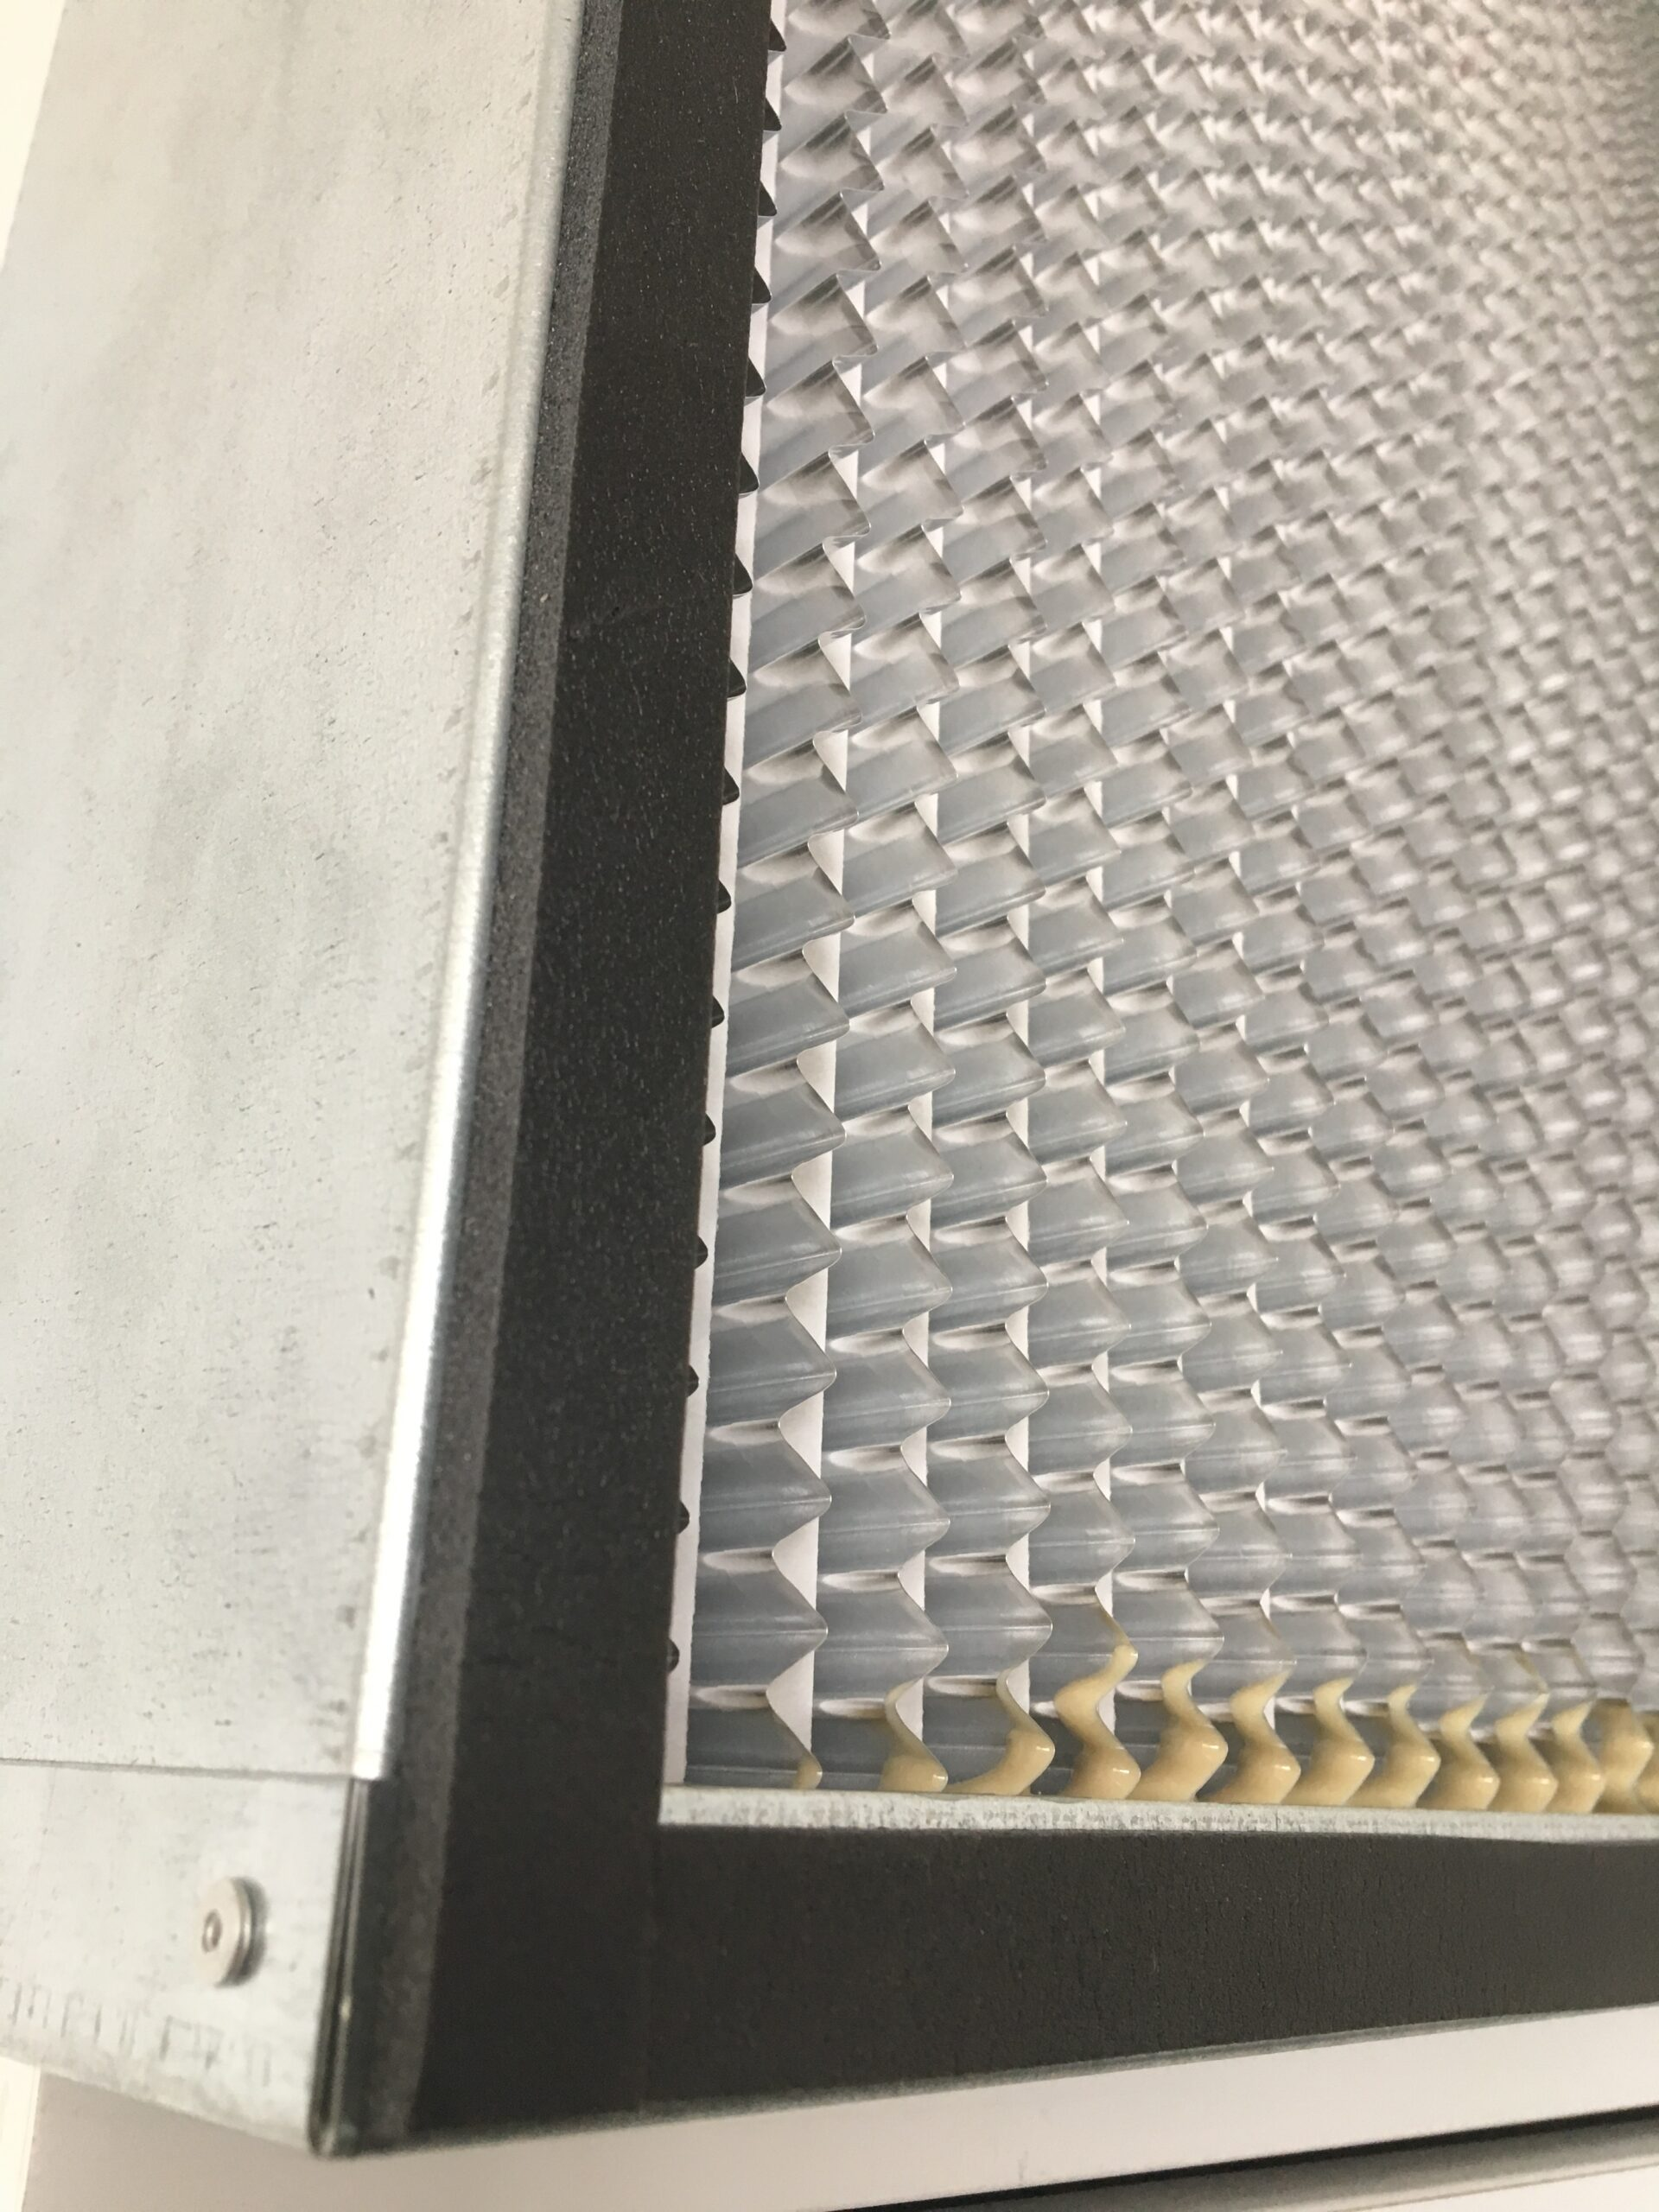 Sellos EPDM para filtros HEPA